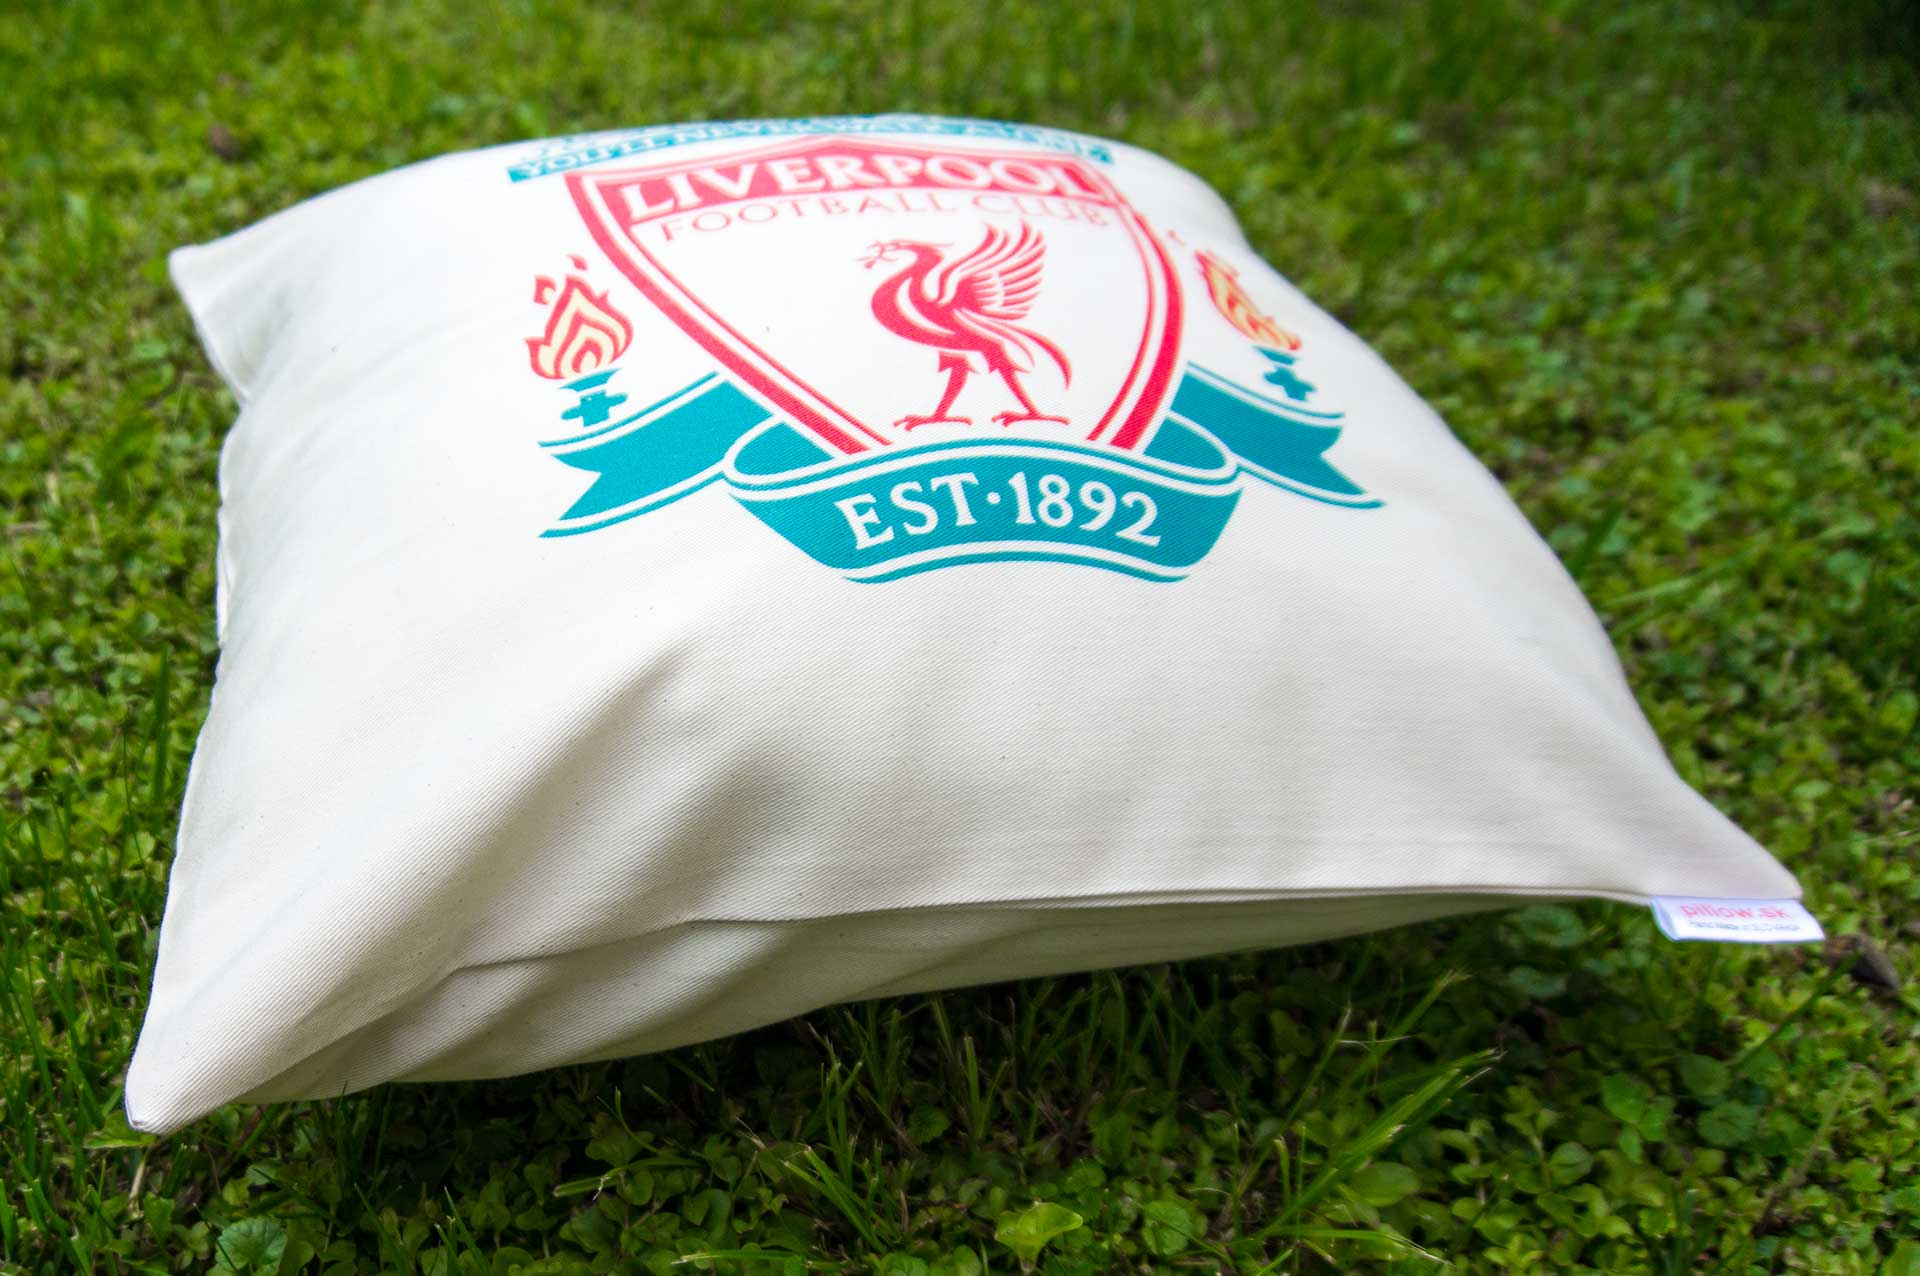 Vankúš s logom FC Liverpool